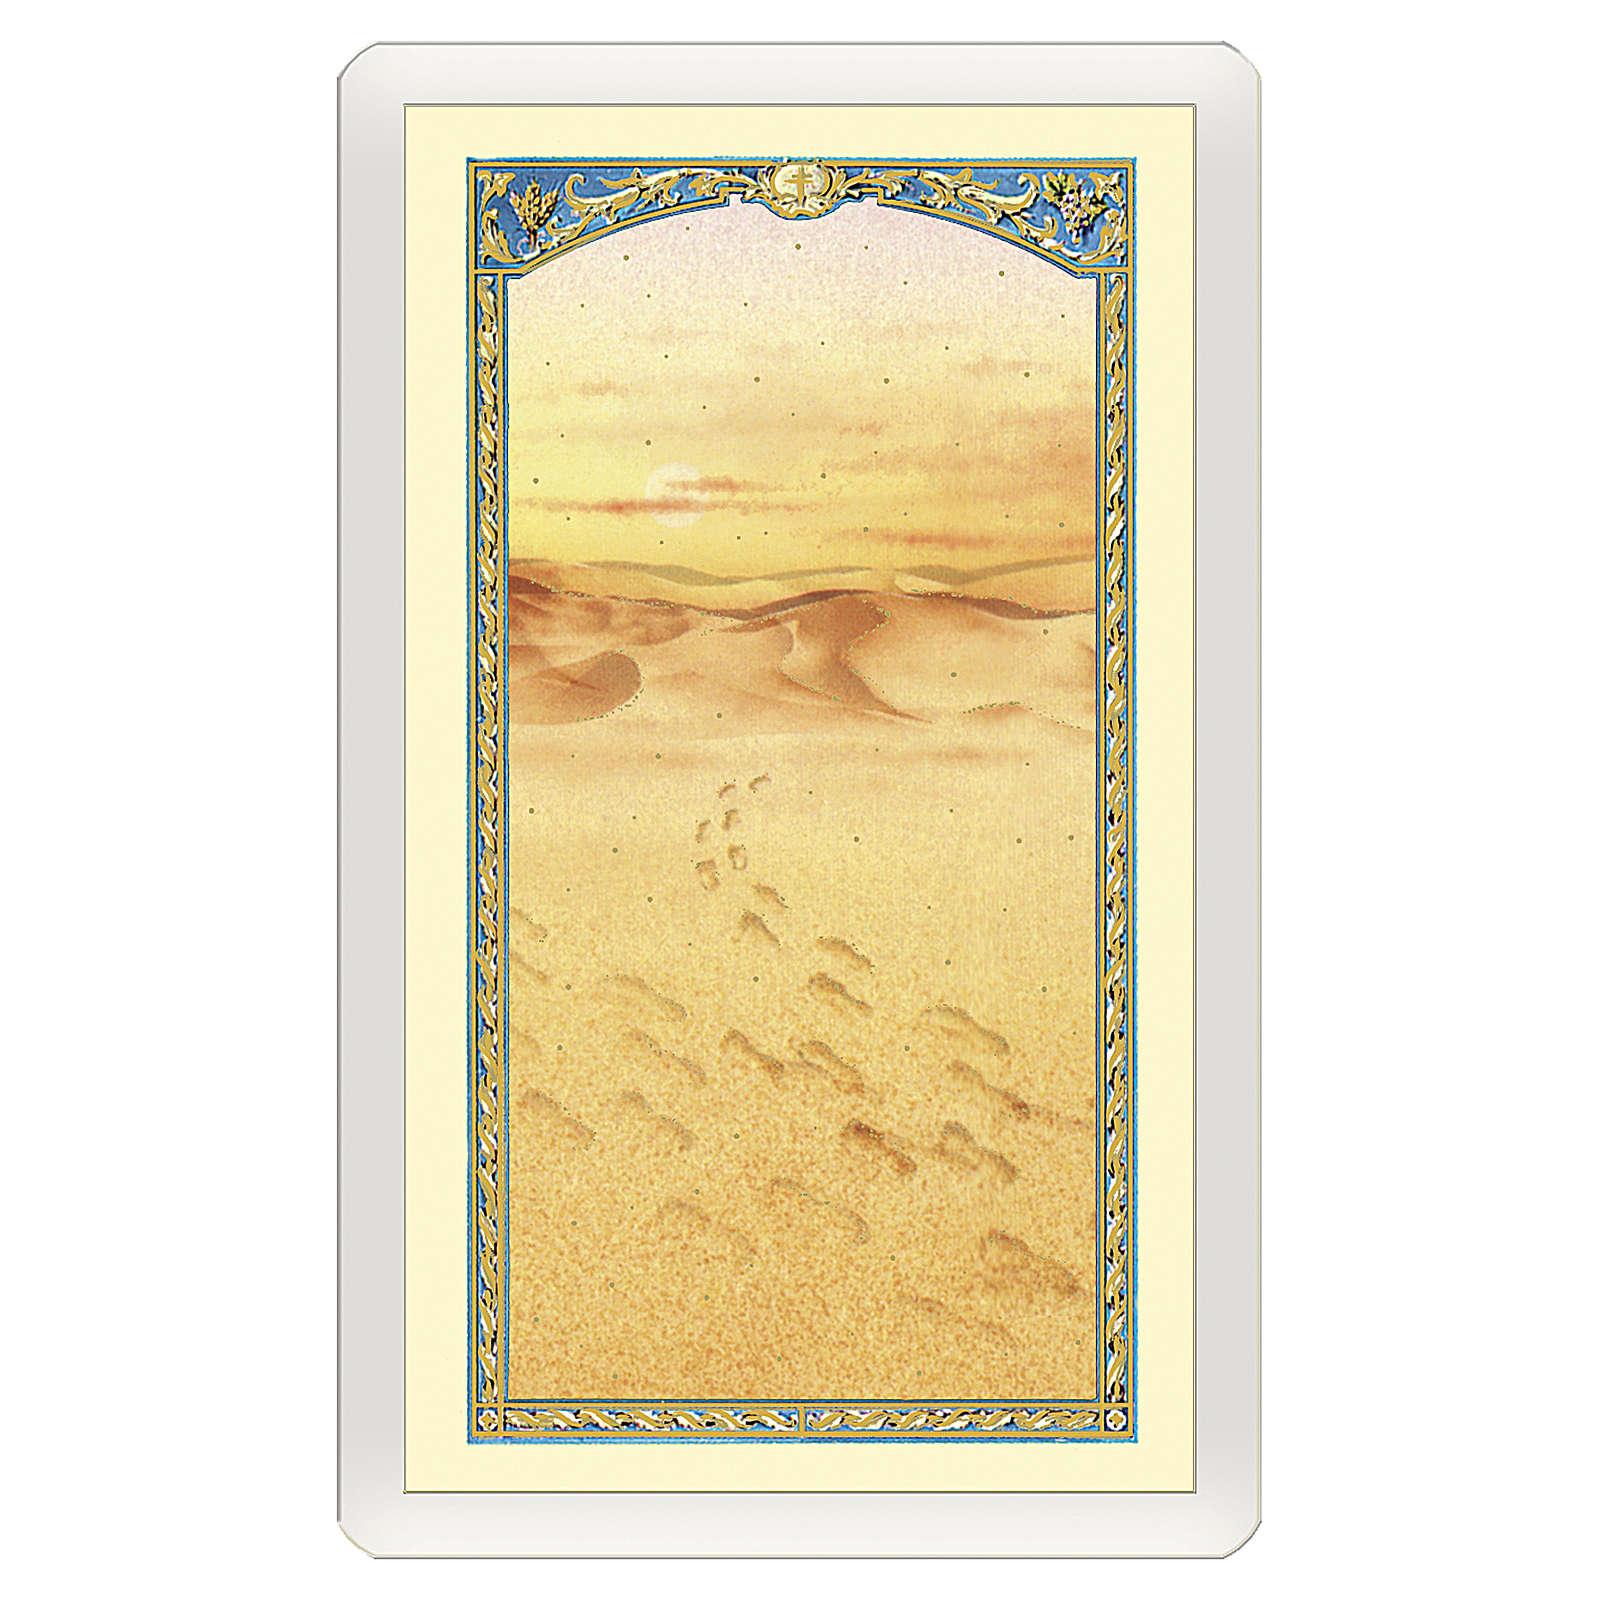 Estampa religiosa Imagen de las huellas en la arena Mensaje de Ternura ITA 10x5 4